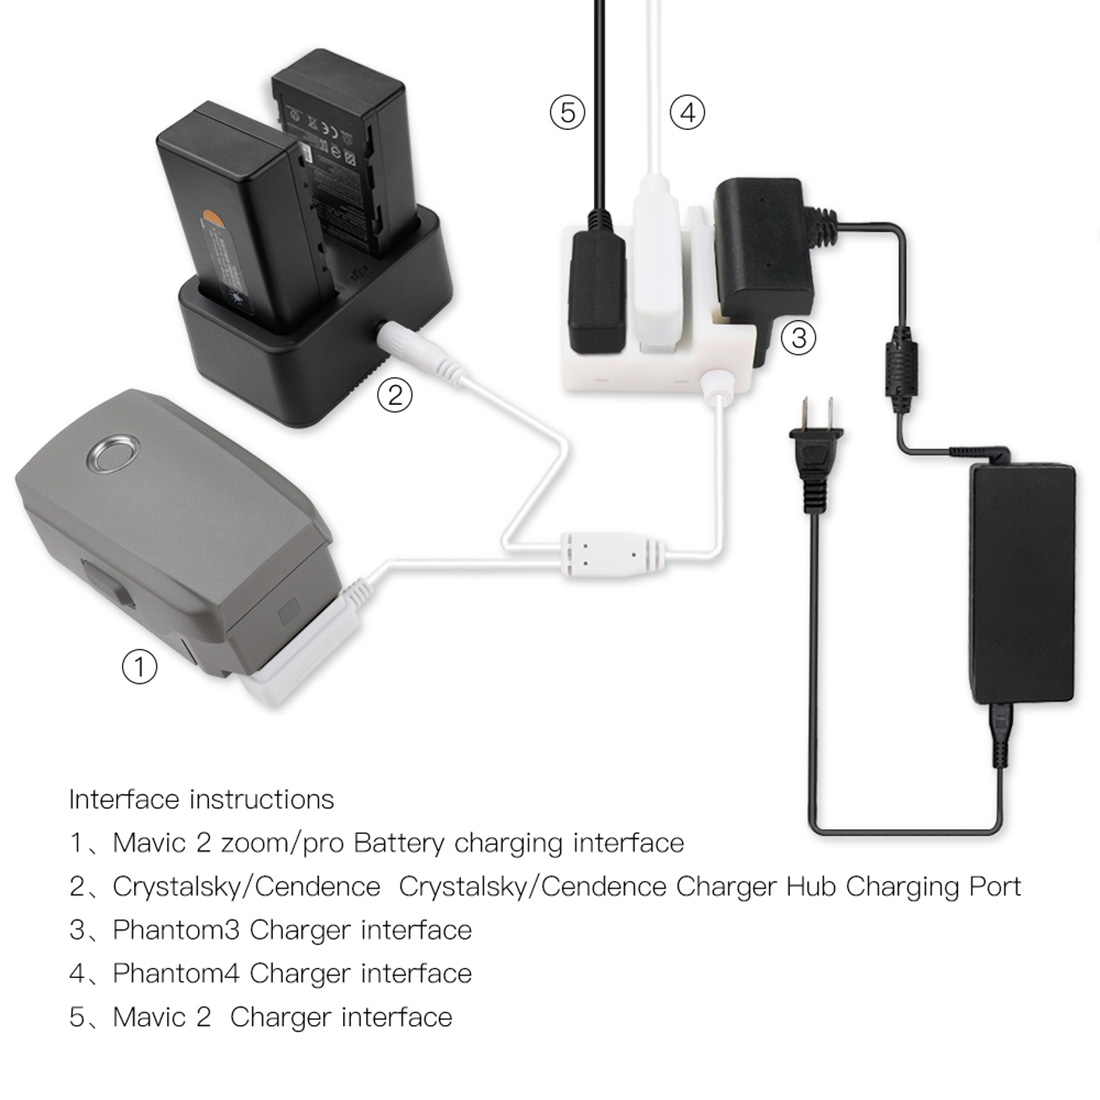 Pour DJI Mavic 2//DJI PHANTOM 3//4 Tension Chargeur Convertisseur de charge HUB Adaptateur